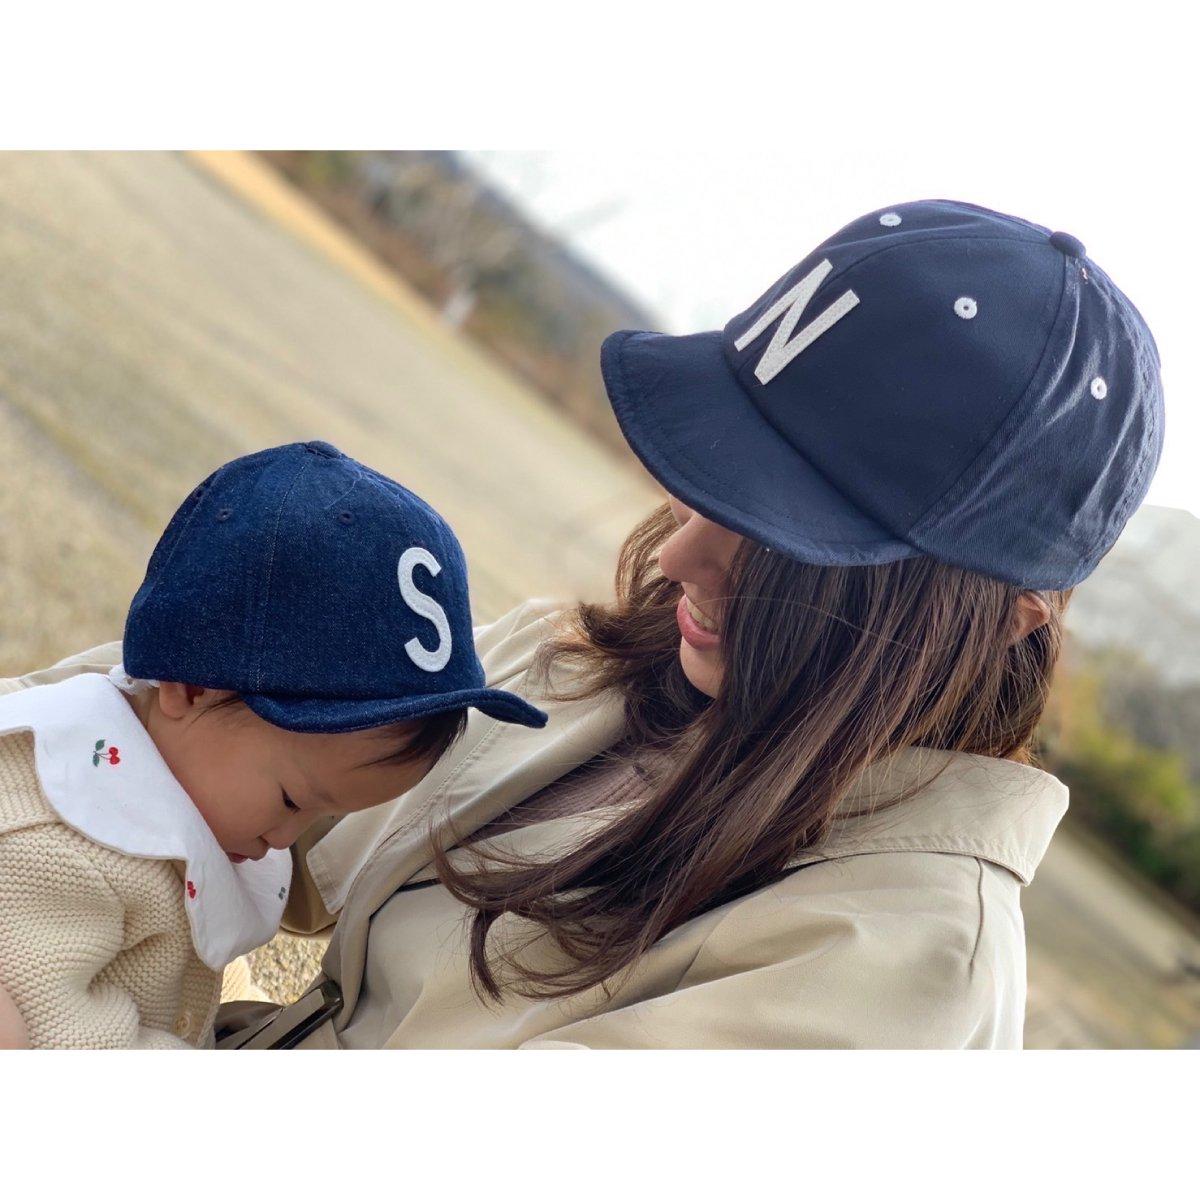 【BABY】Baby Sim Logo Cap 詳細画像28